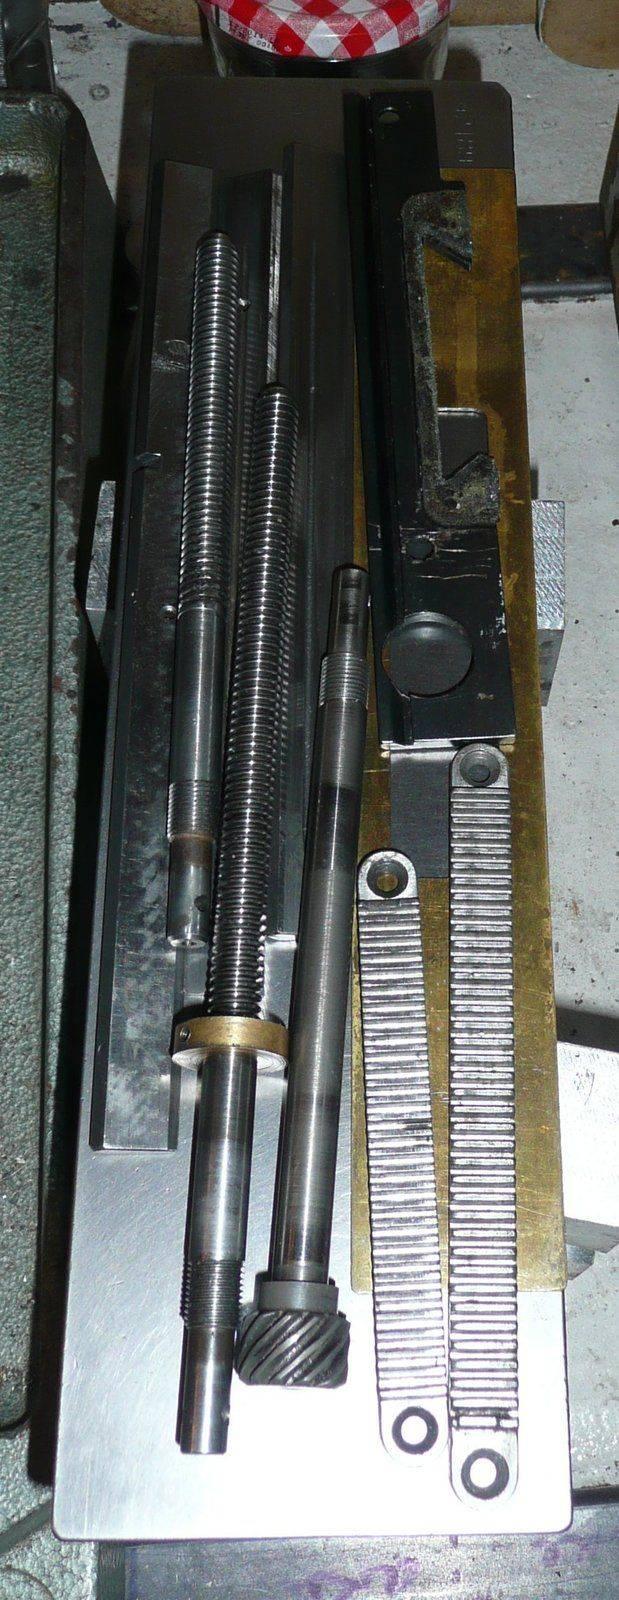 P1160286.JPG